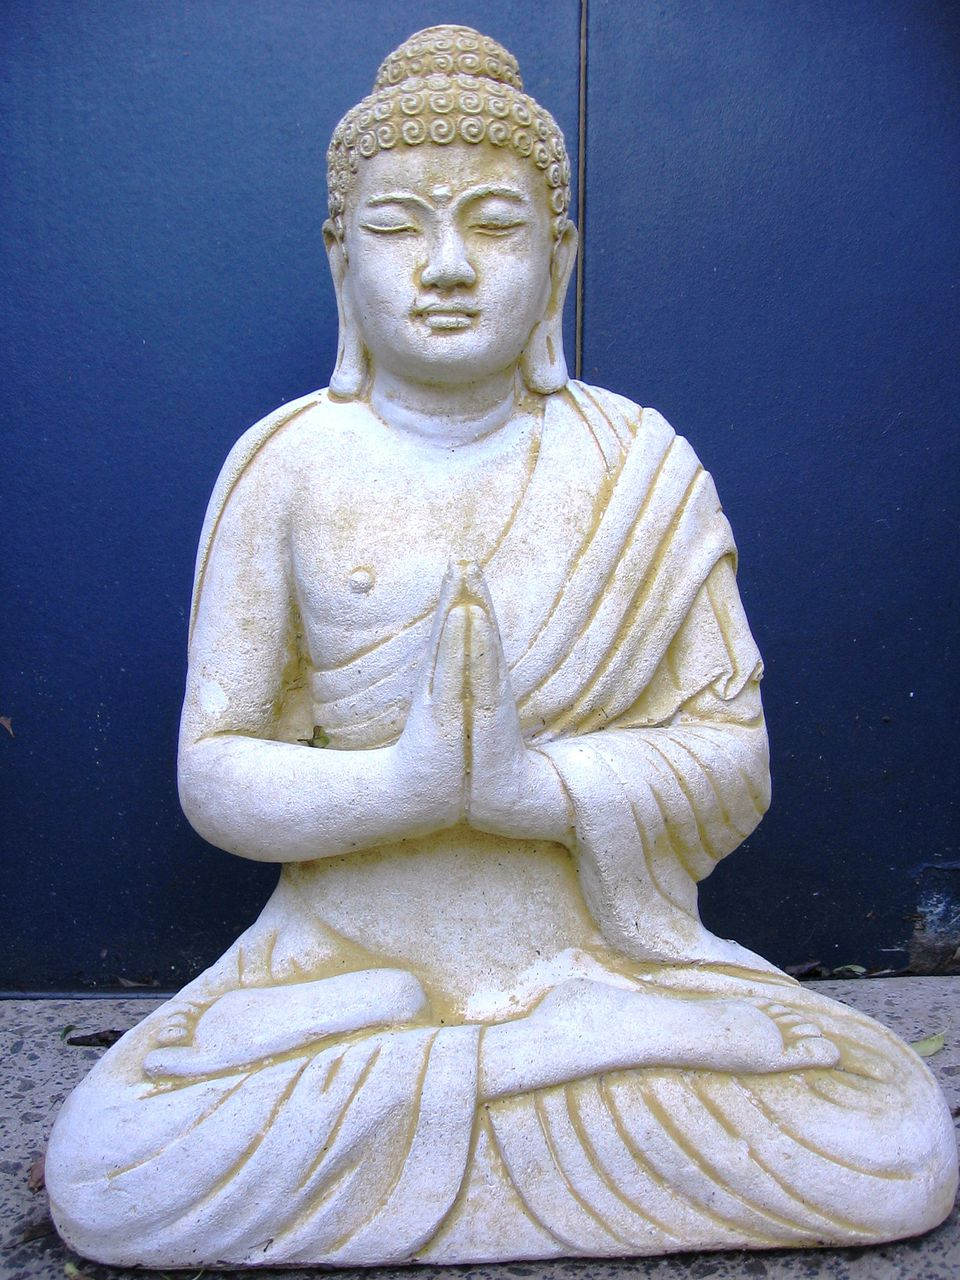 Placement of buddha hand symbols in your home namaskara hand gesture joe bennettwikimedia commonscc by 20 buycottarizona